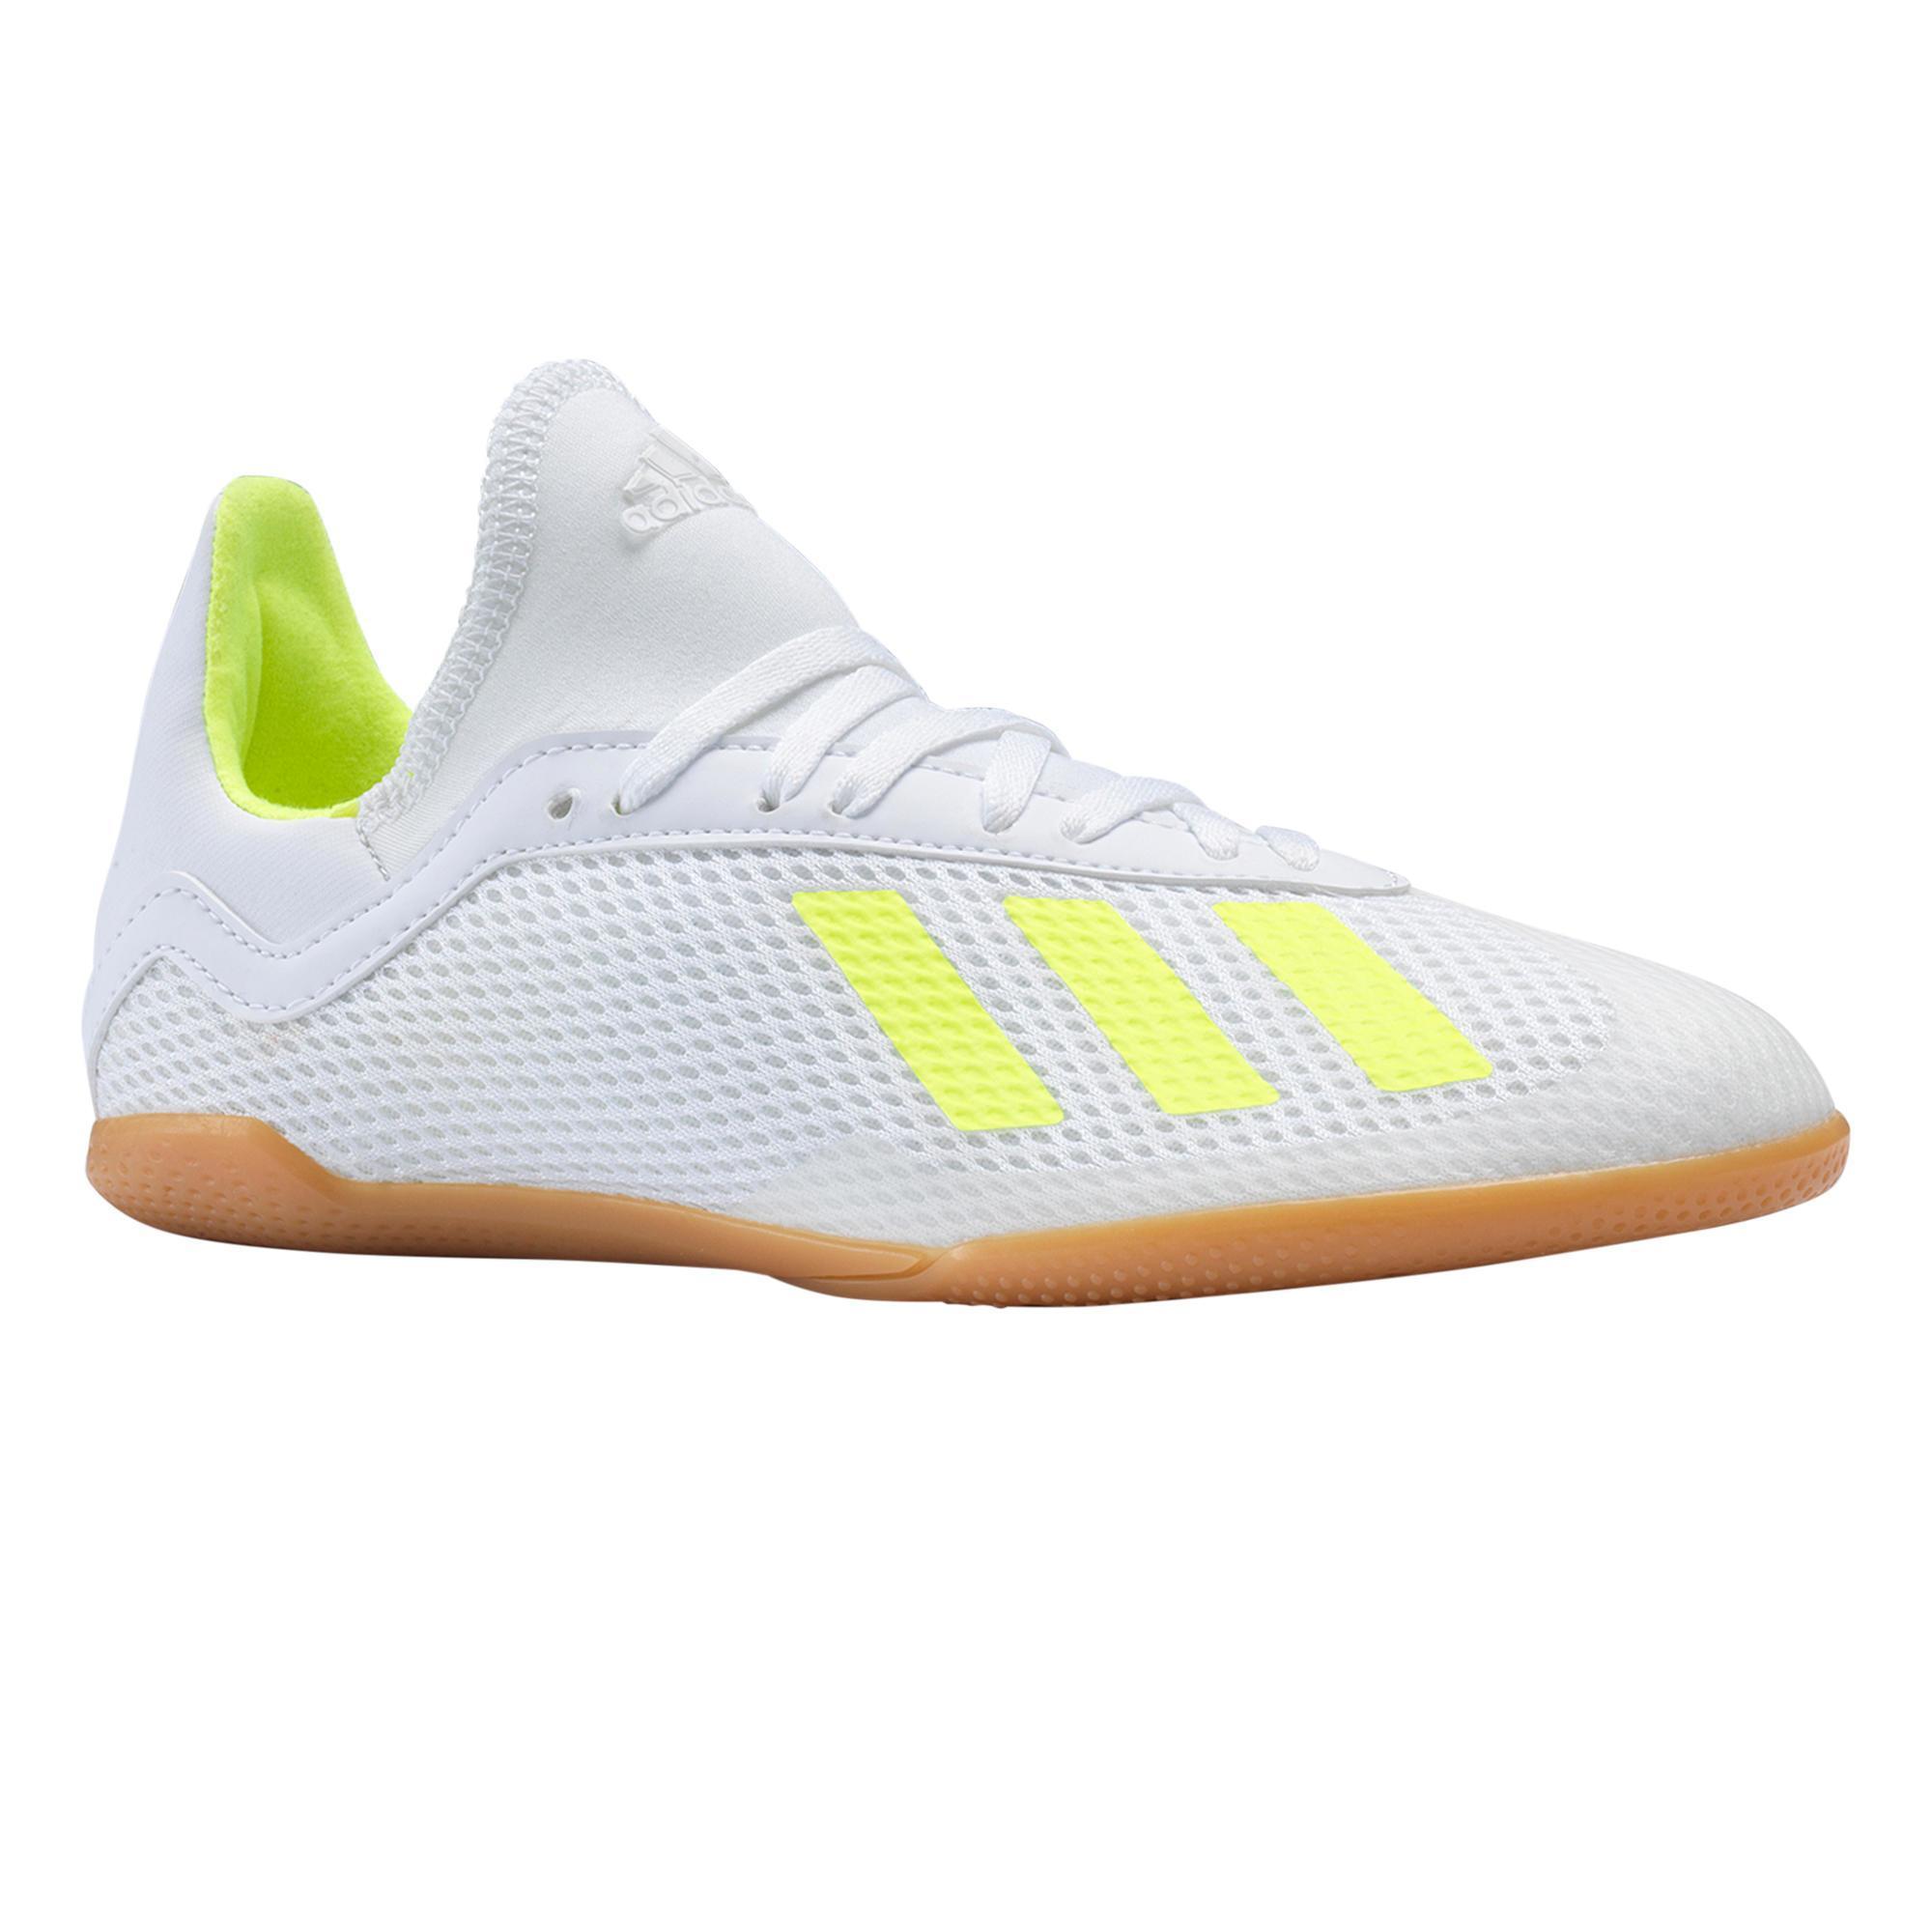 Adidas Zaalvoetbalschoenen kind X Tango 19.3 IC wit/geel